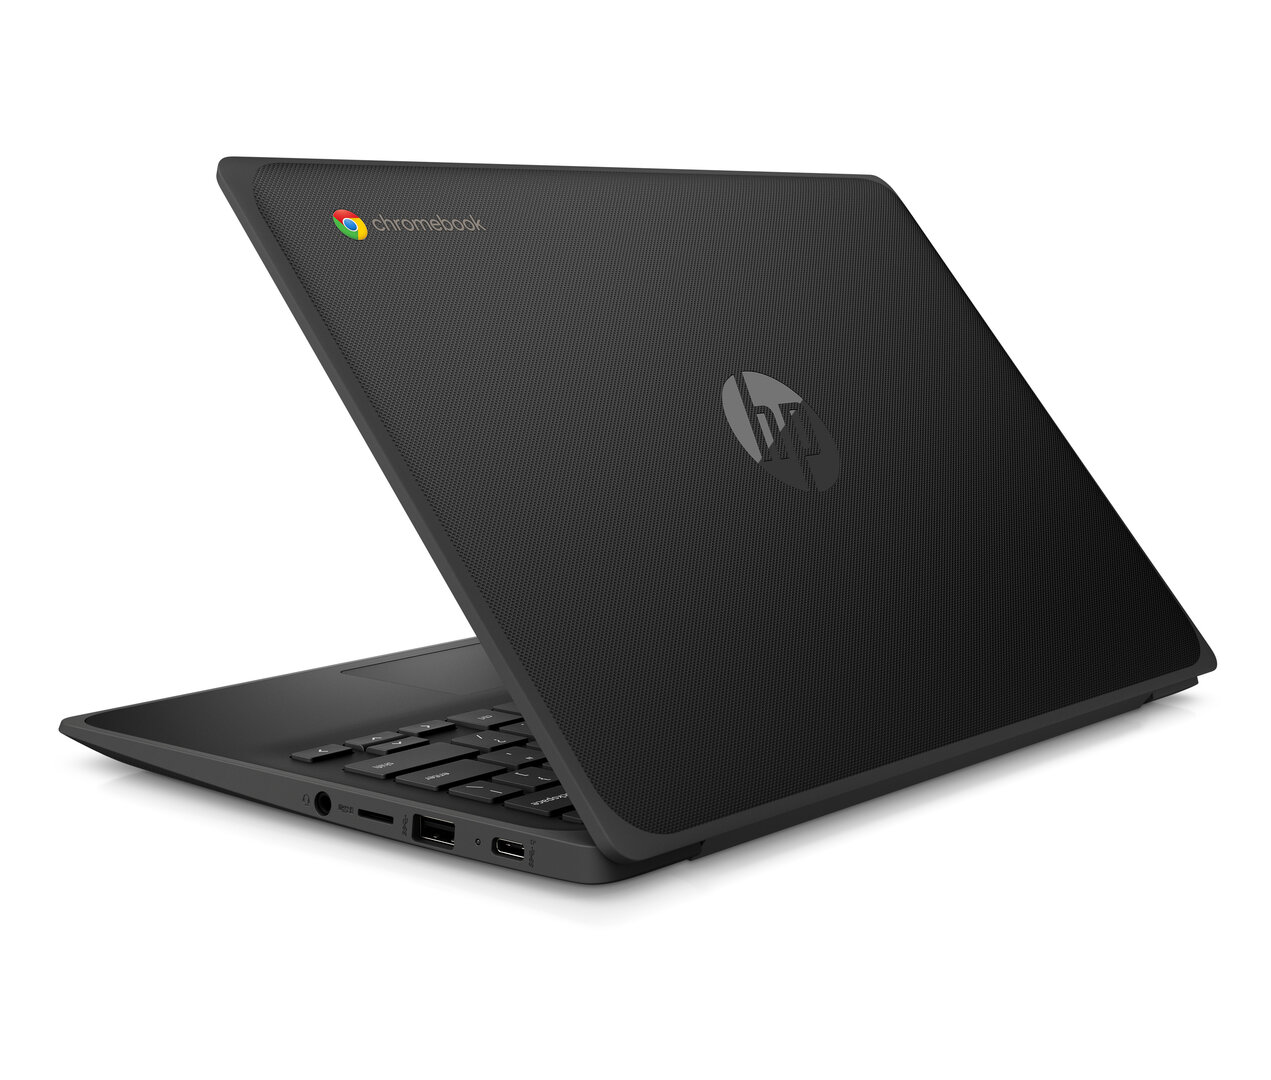 HP Chromebook 11 G9 EE (Jet Black)